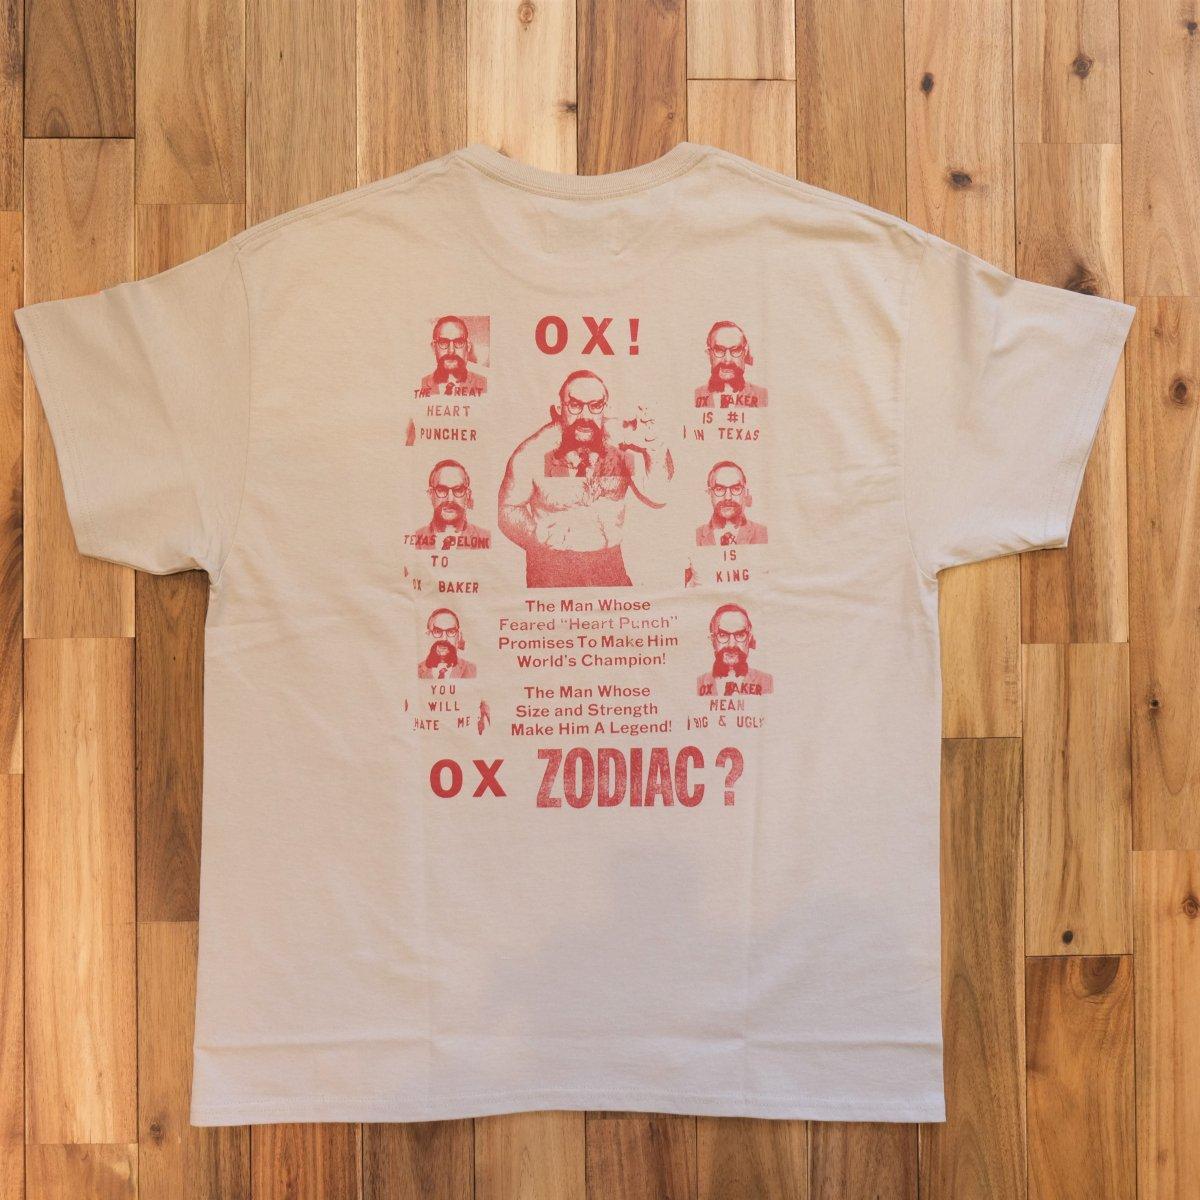 <img class='new_mark_img1' src='https://img.shop-pro.jp/img/new/icons3.gif' style='border:none;display:inline;margin:0px;padding:0px;width:auto;' />Black Weirdos  ブラック ウィドー / Tシャツ OX Tee 【BEIGE】